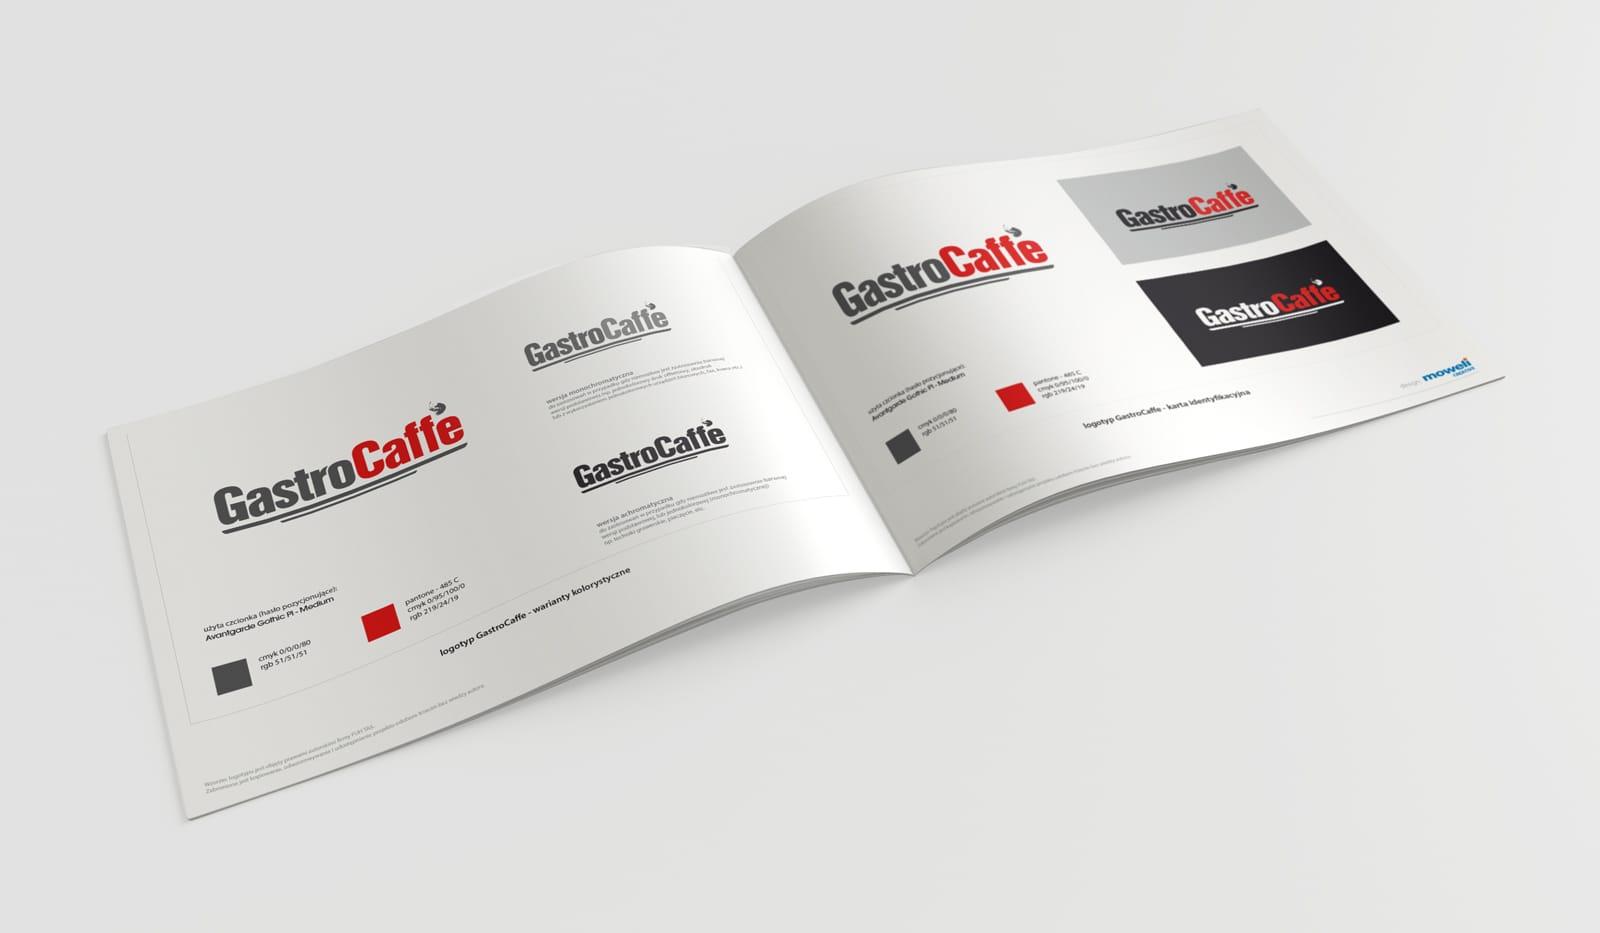 Gastrocaffe księga znaku Agencja brandingowa Moweli Creative